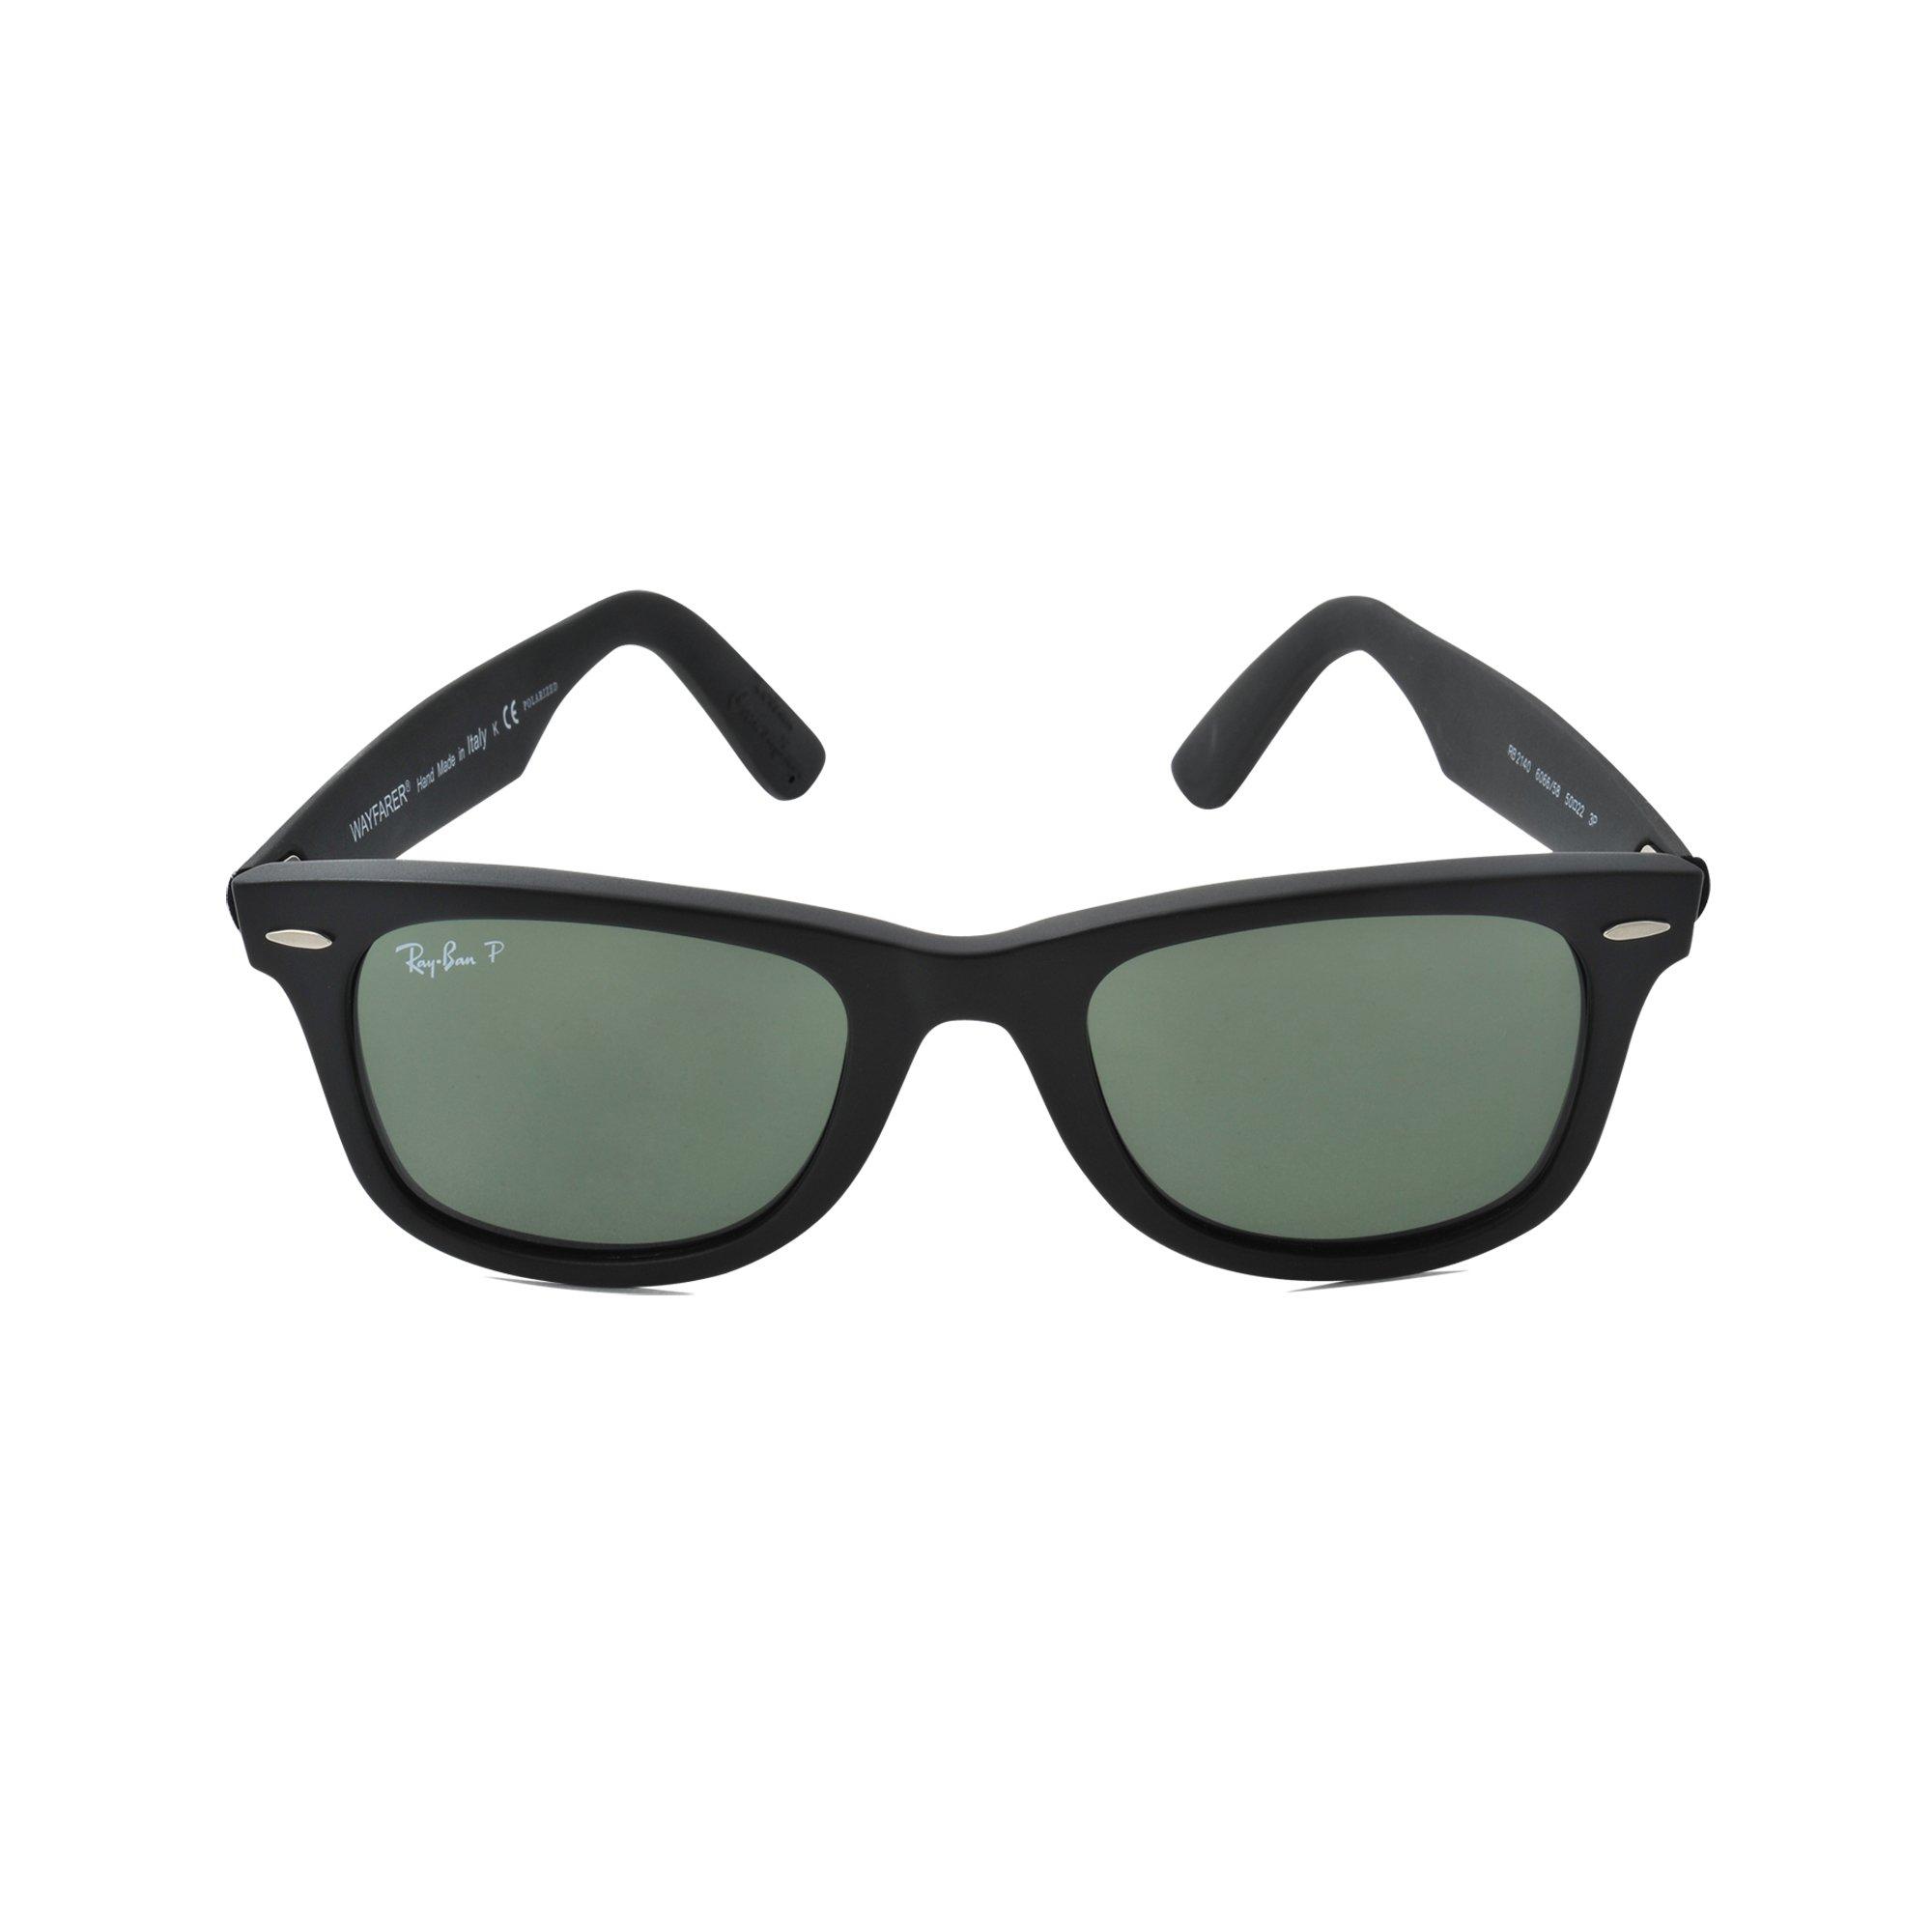 f1f03360ed Chanel Sunglasses Ray Ban Style « Heritage Malta